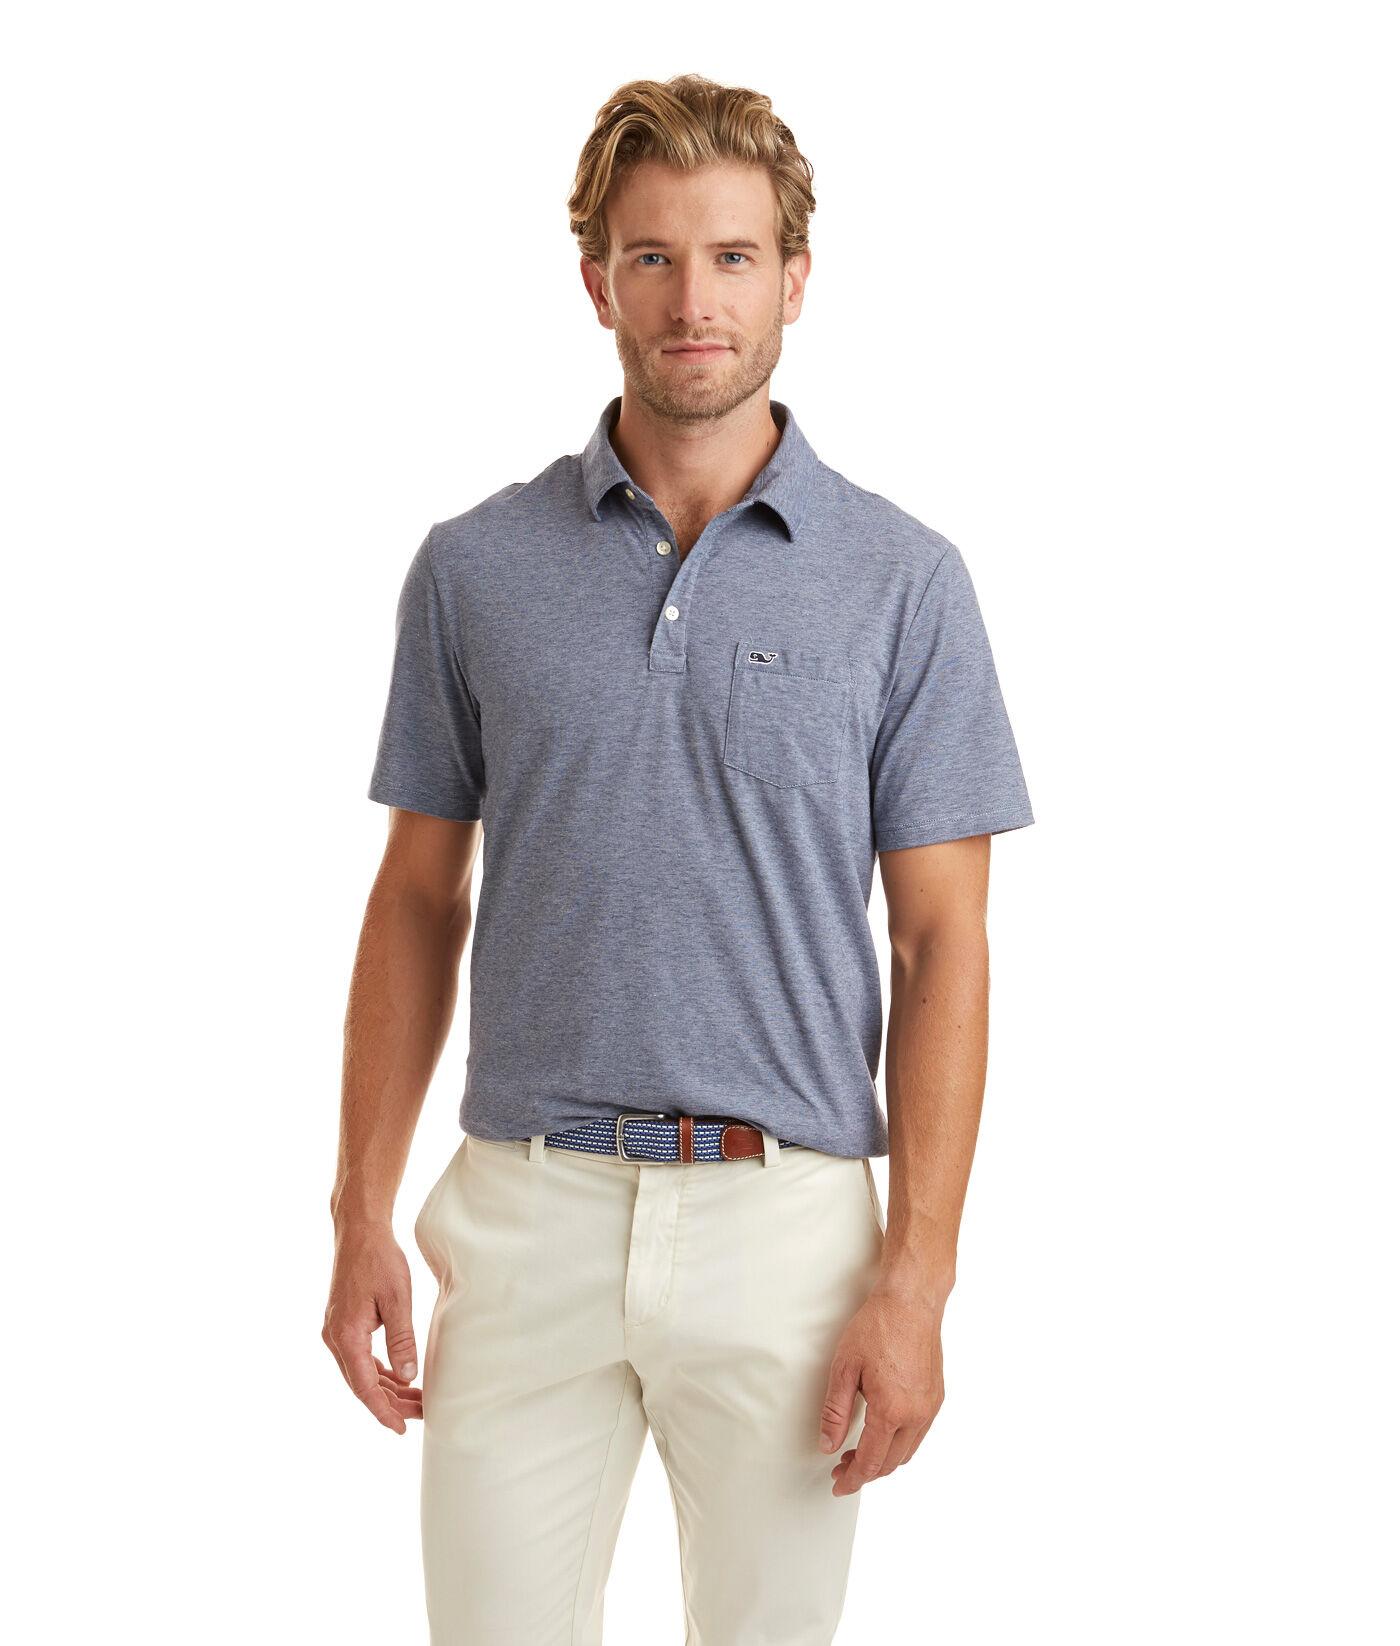 Shirts Vineyard Vines Pink White Striped Short Sleeve Polo Shirt Pocket Mens Sz M Various Styles